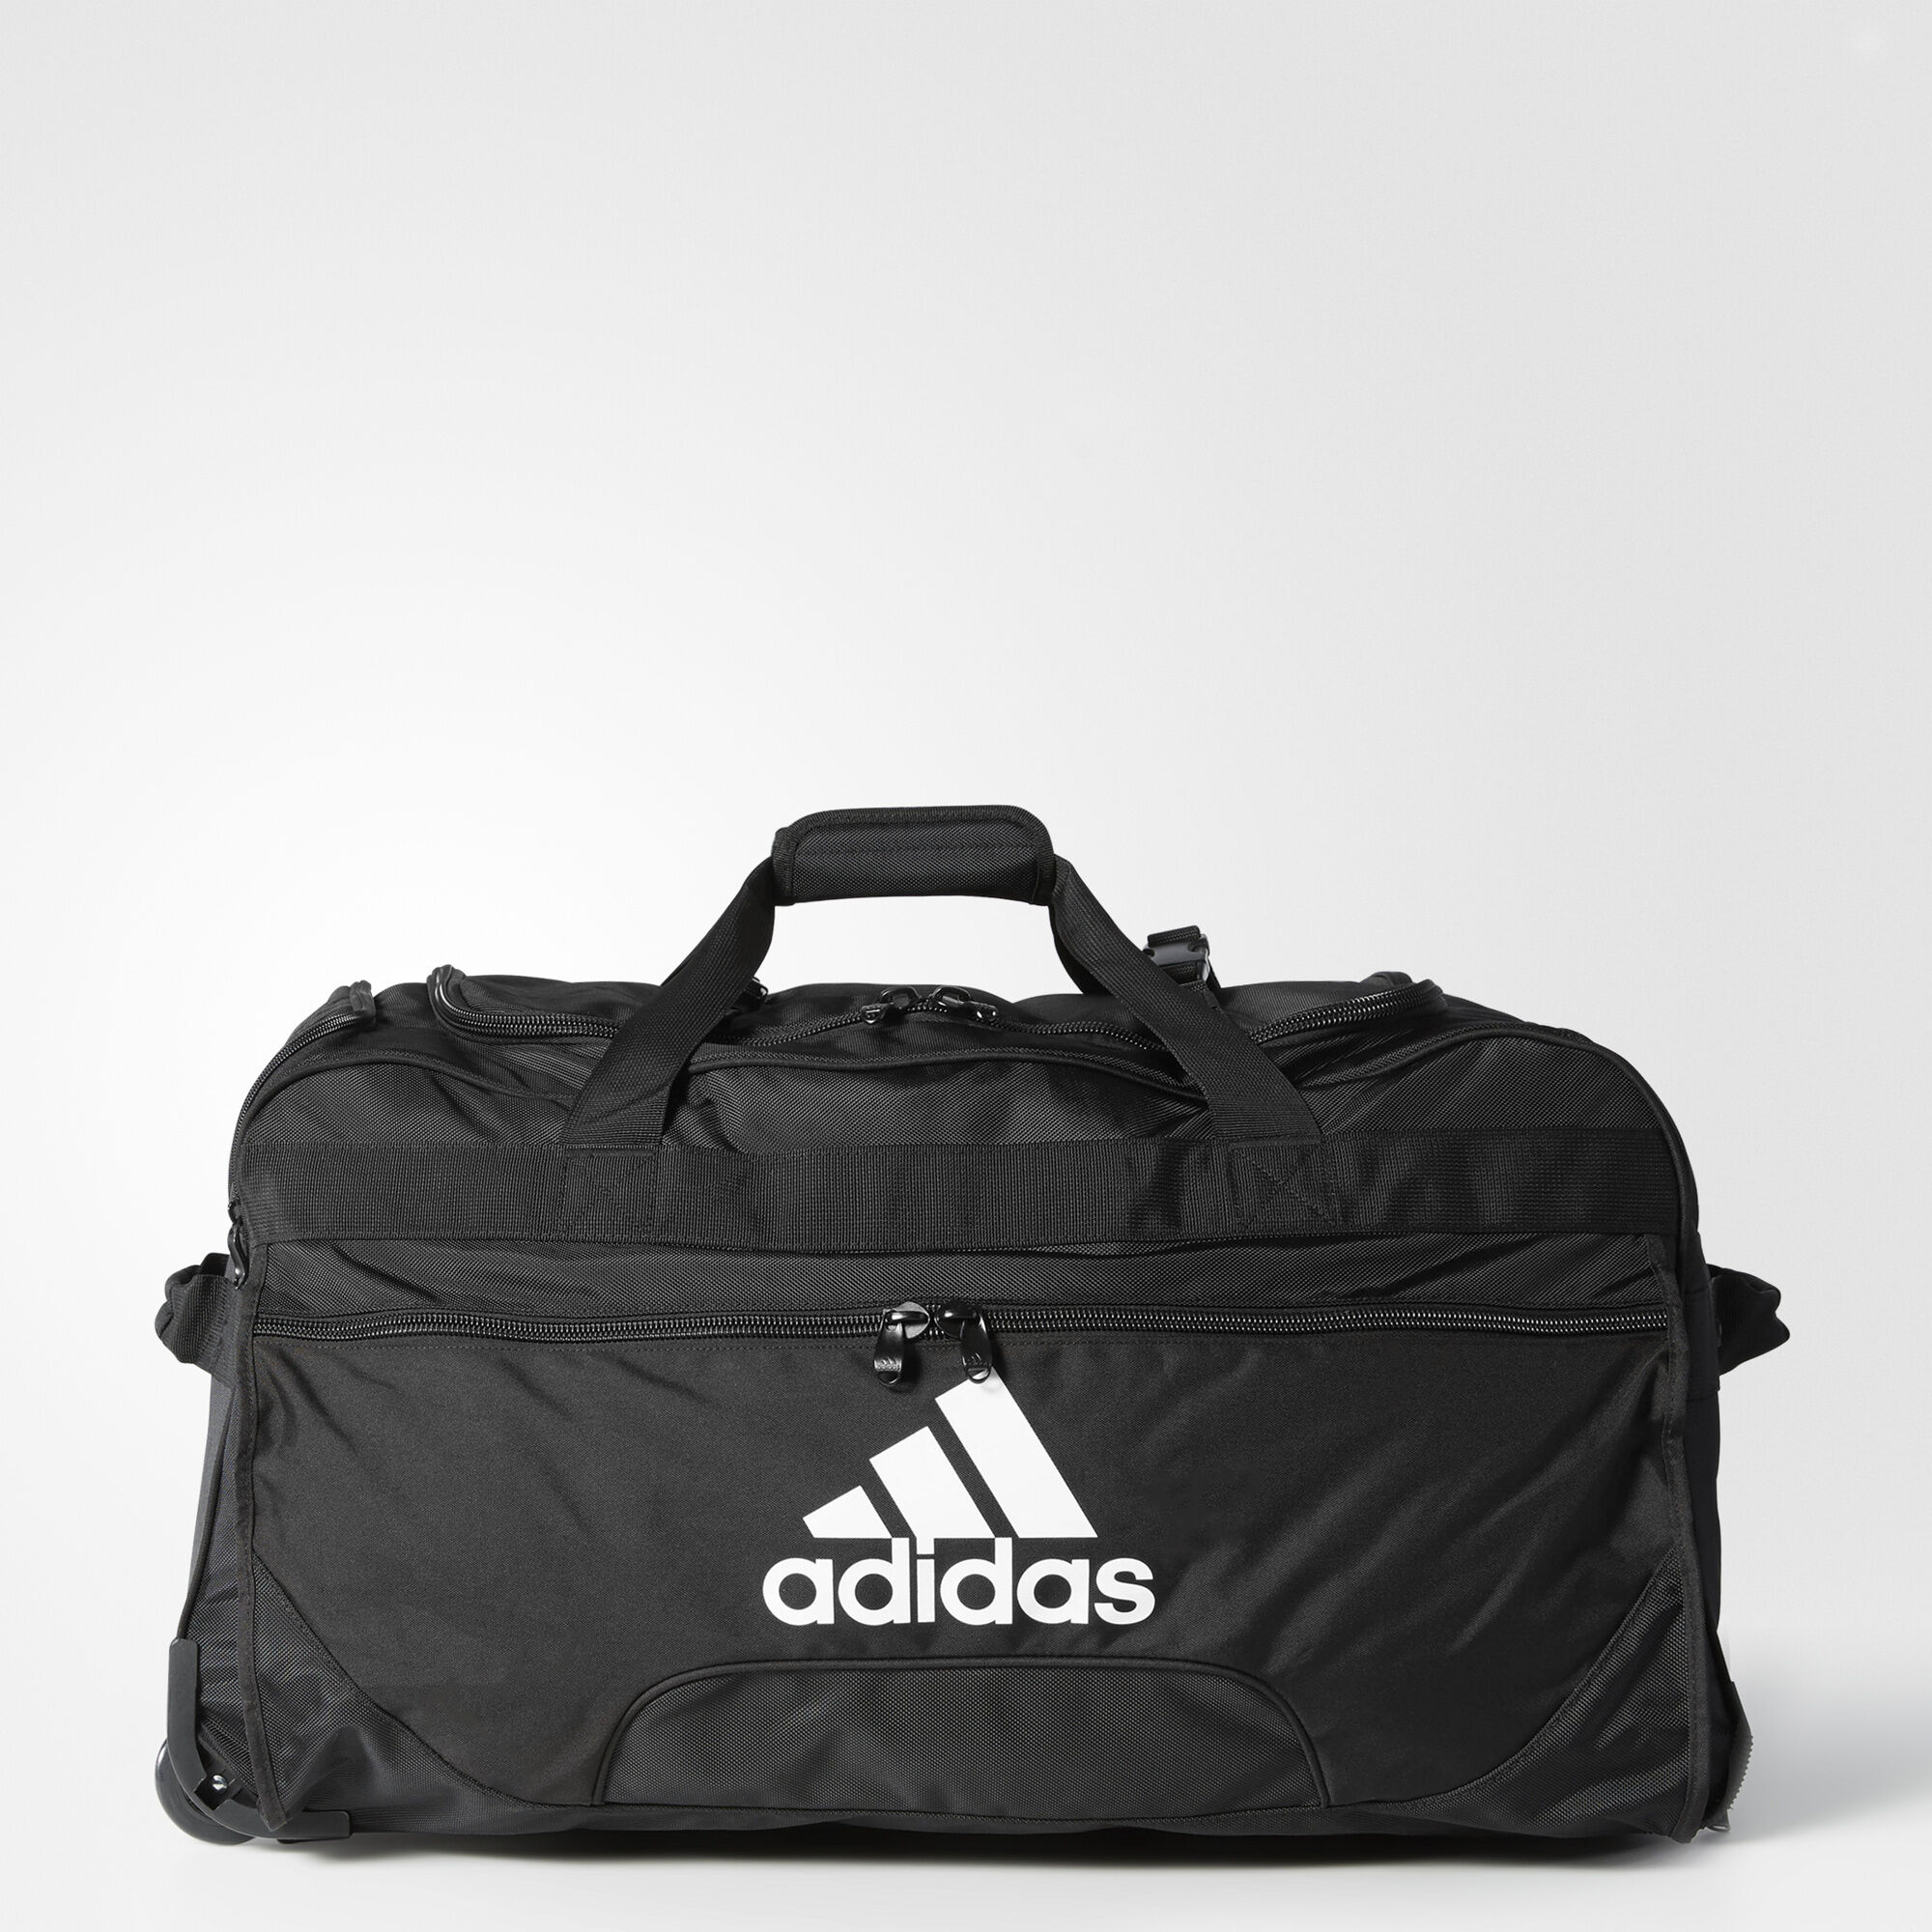 300bb1c03971f Adidas Handbags Images. adidas originals AC MINI BAG ...